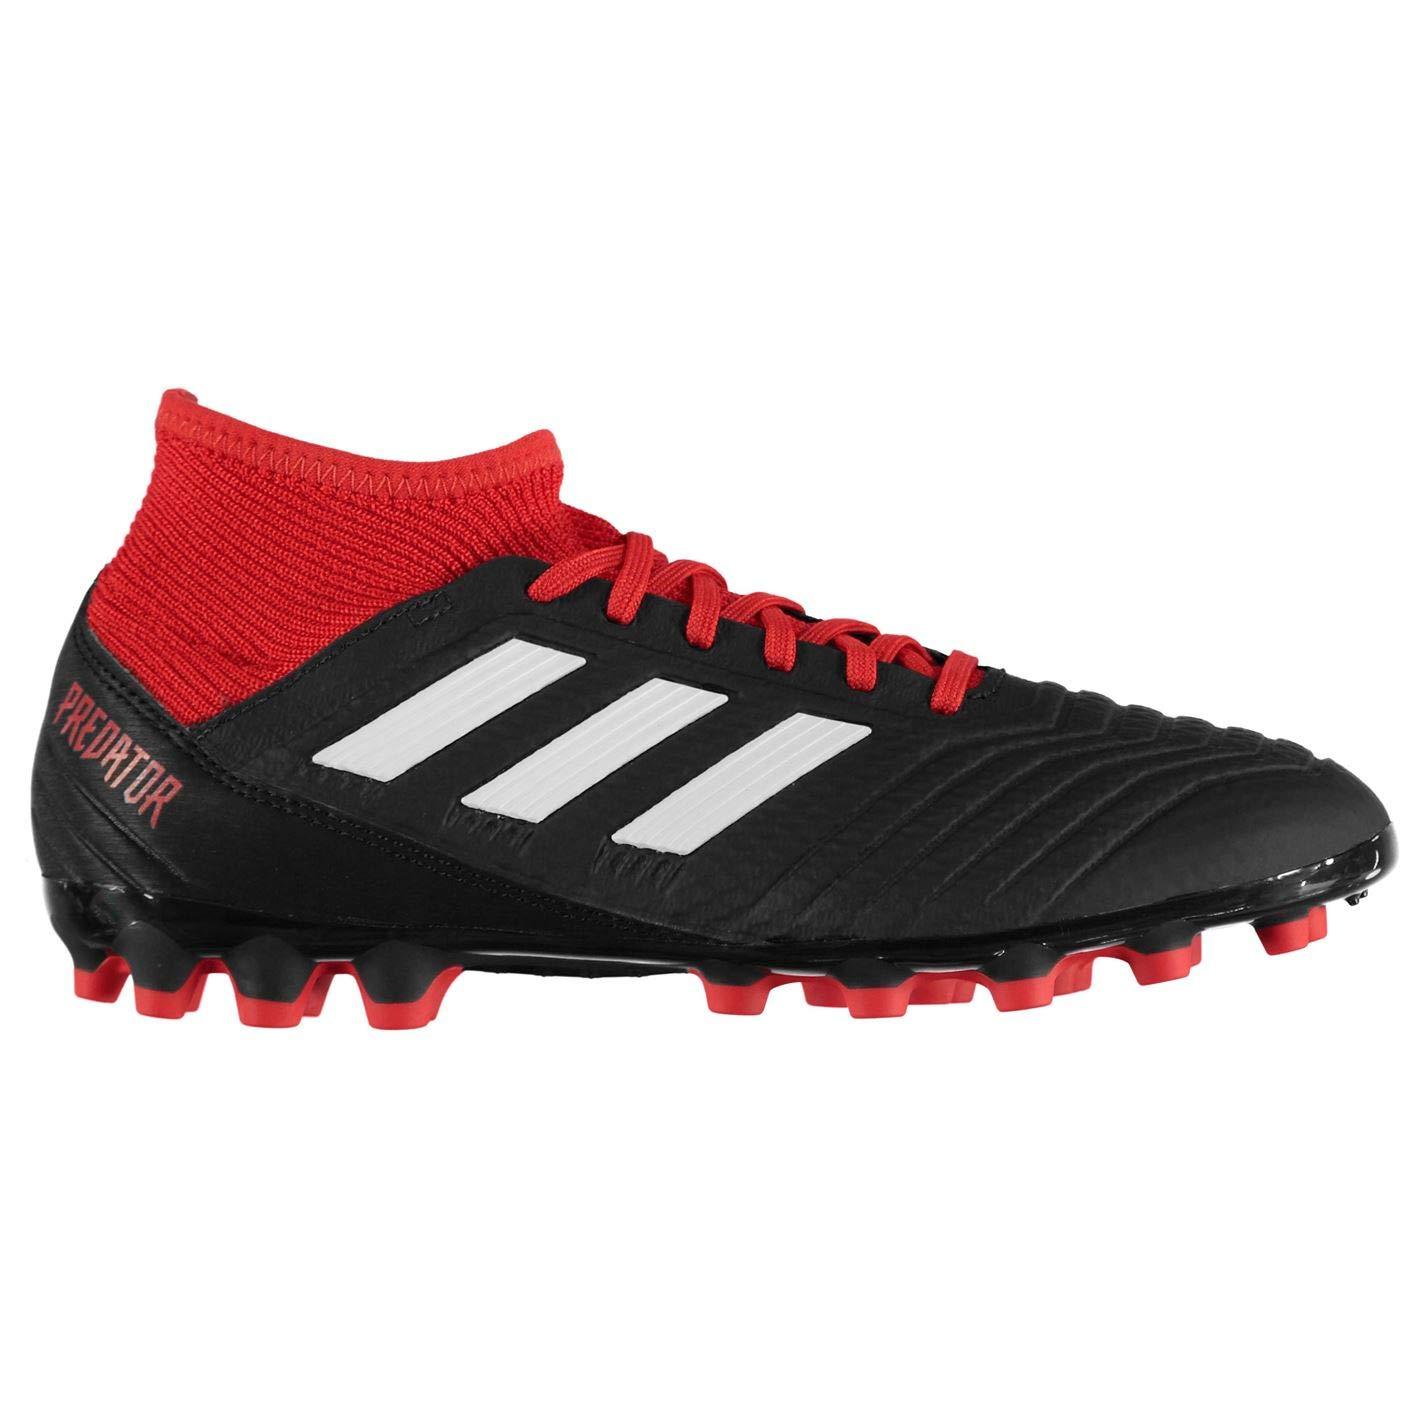 Adidas Herren PROTator 18.3 Ag Fußballschuhe, Weiß Schwarz Rot, 40 2 3 EU